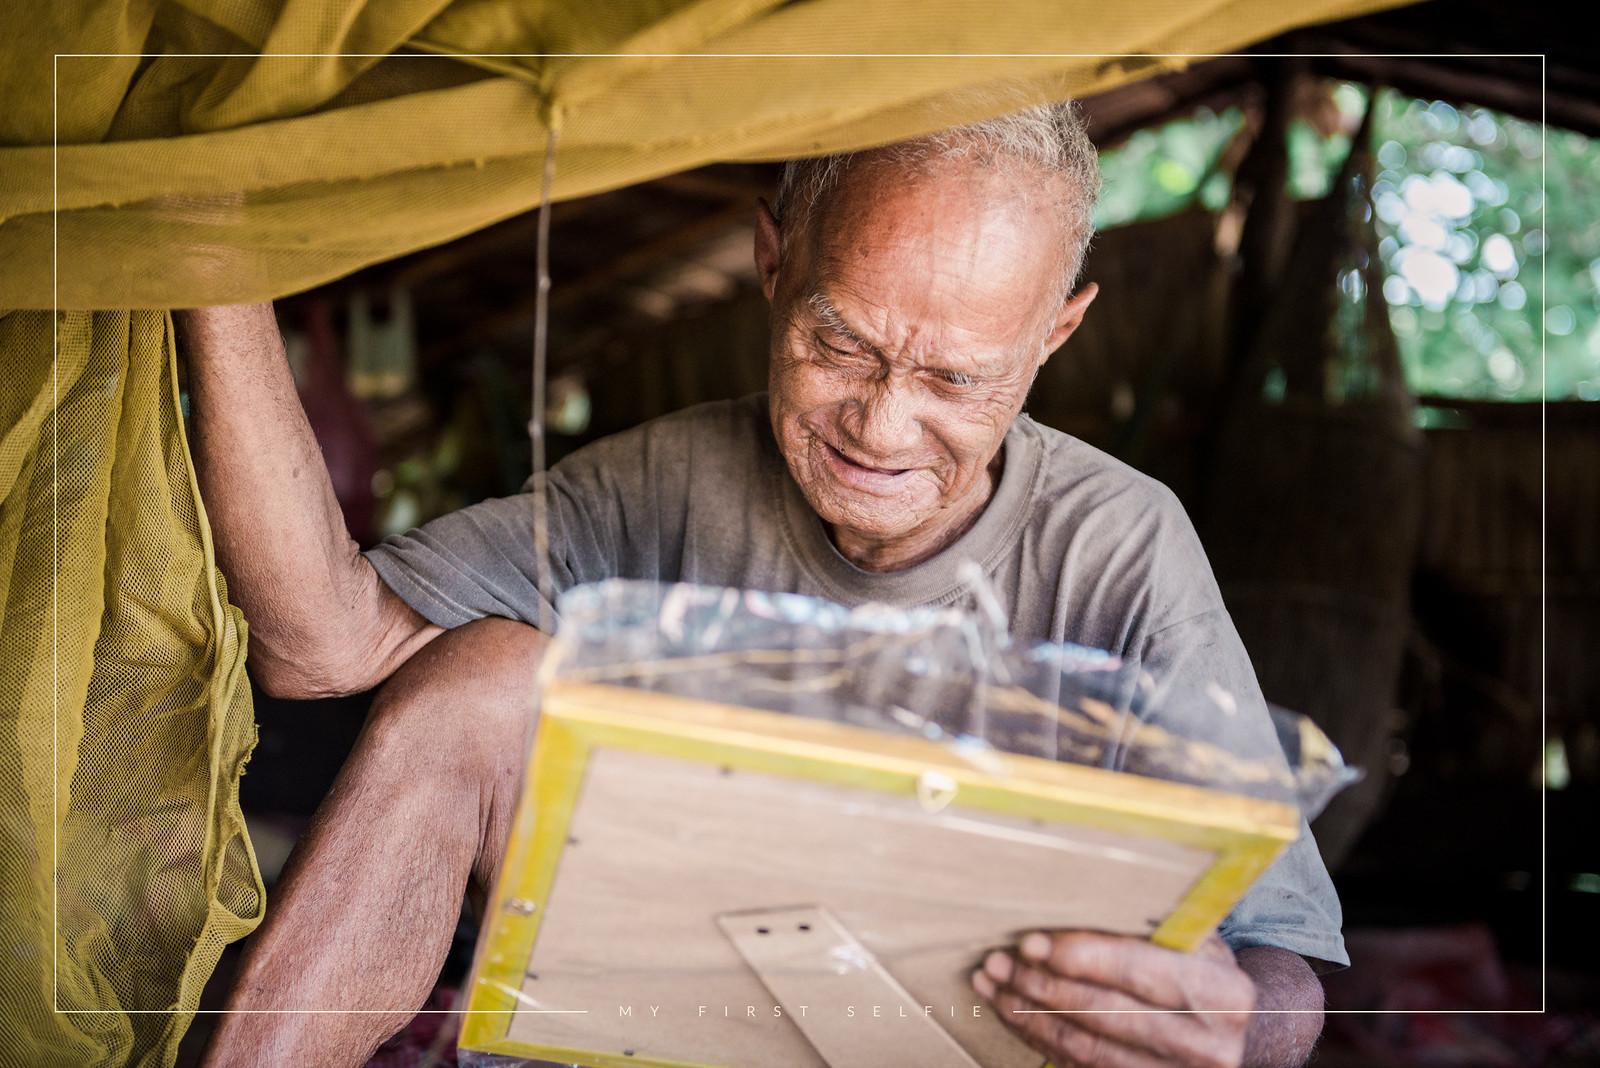 An elderly man enjoying his first portrait photo